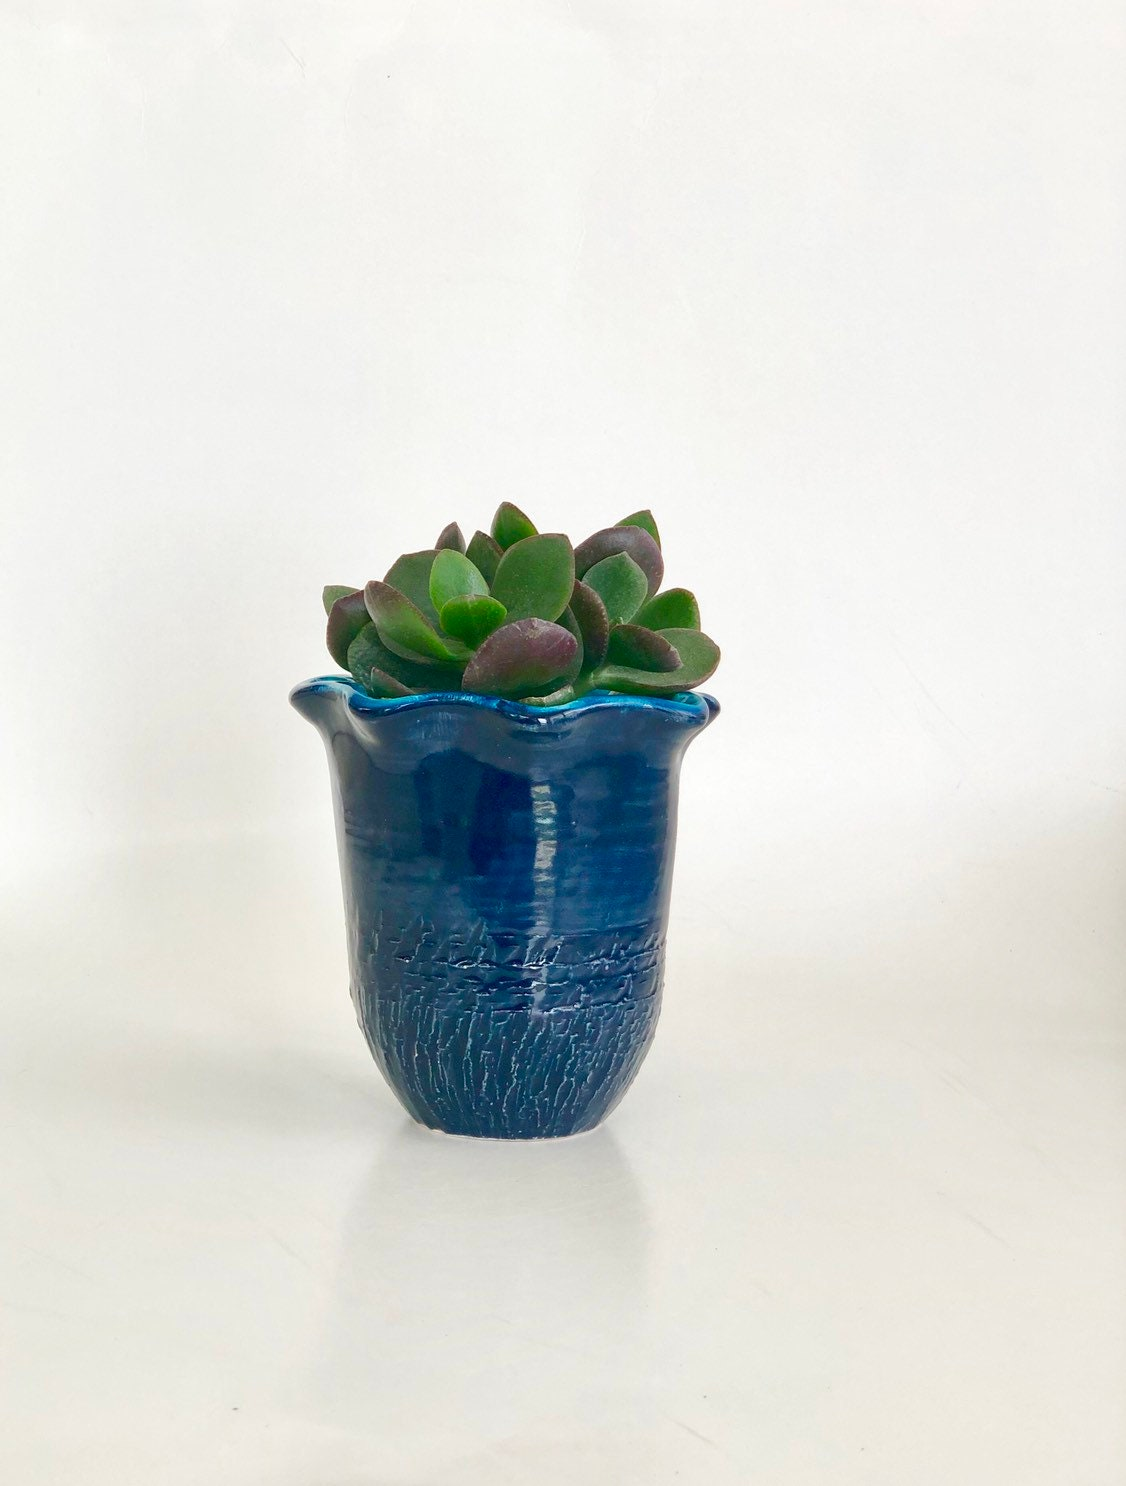 Small Ceramic Vase Blue Flower Vase Navy Pottery Vase Ceramic Flower Vase Bud Vase Flower Vases Ceramic Bud Vase Handmade Vase